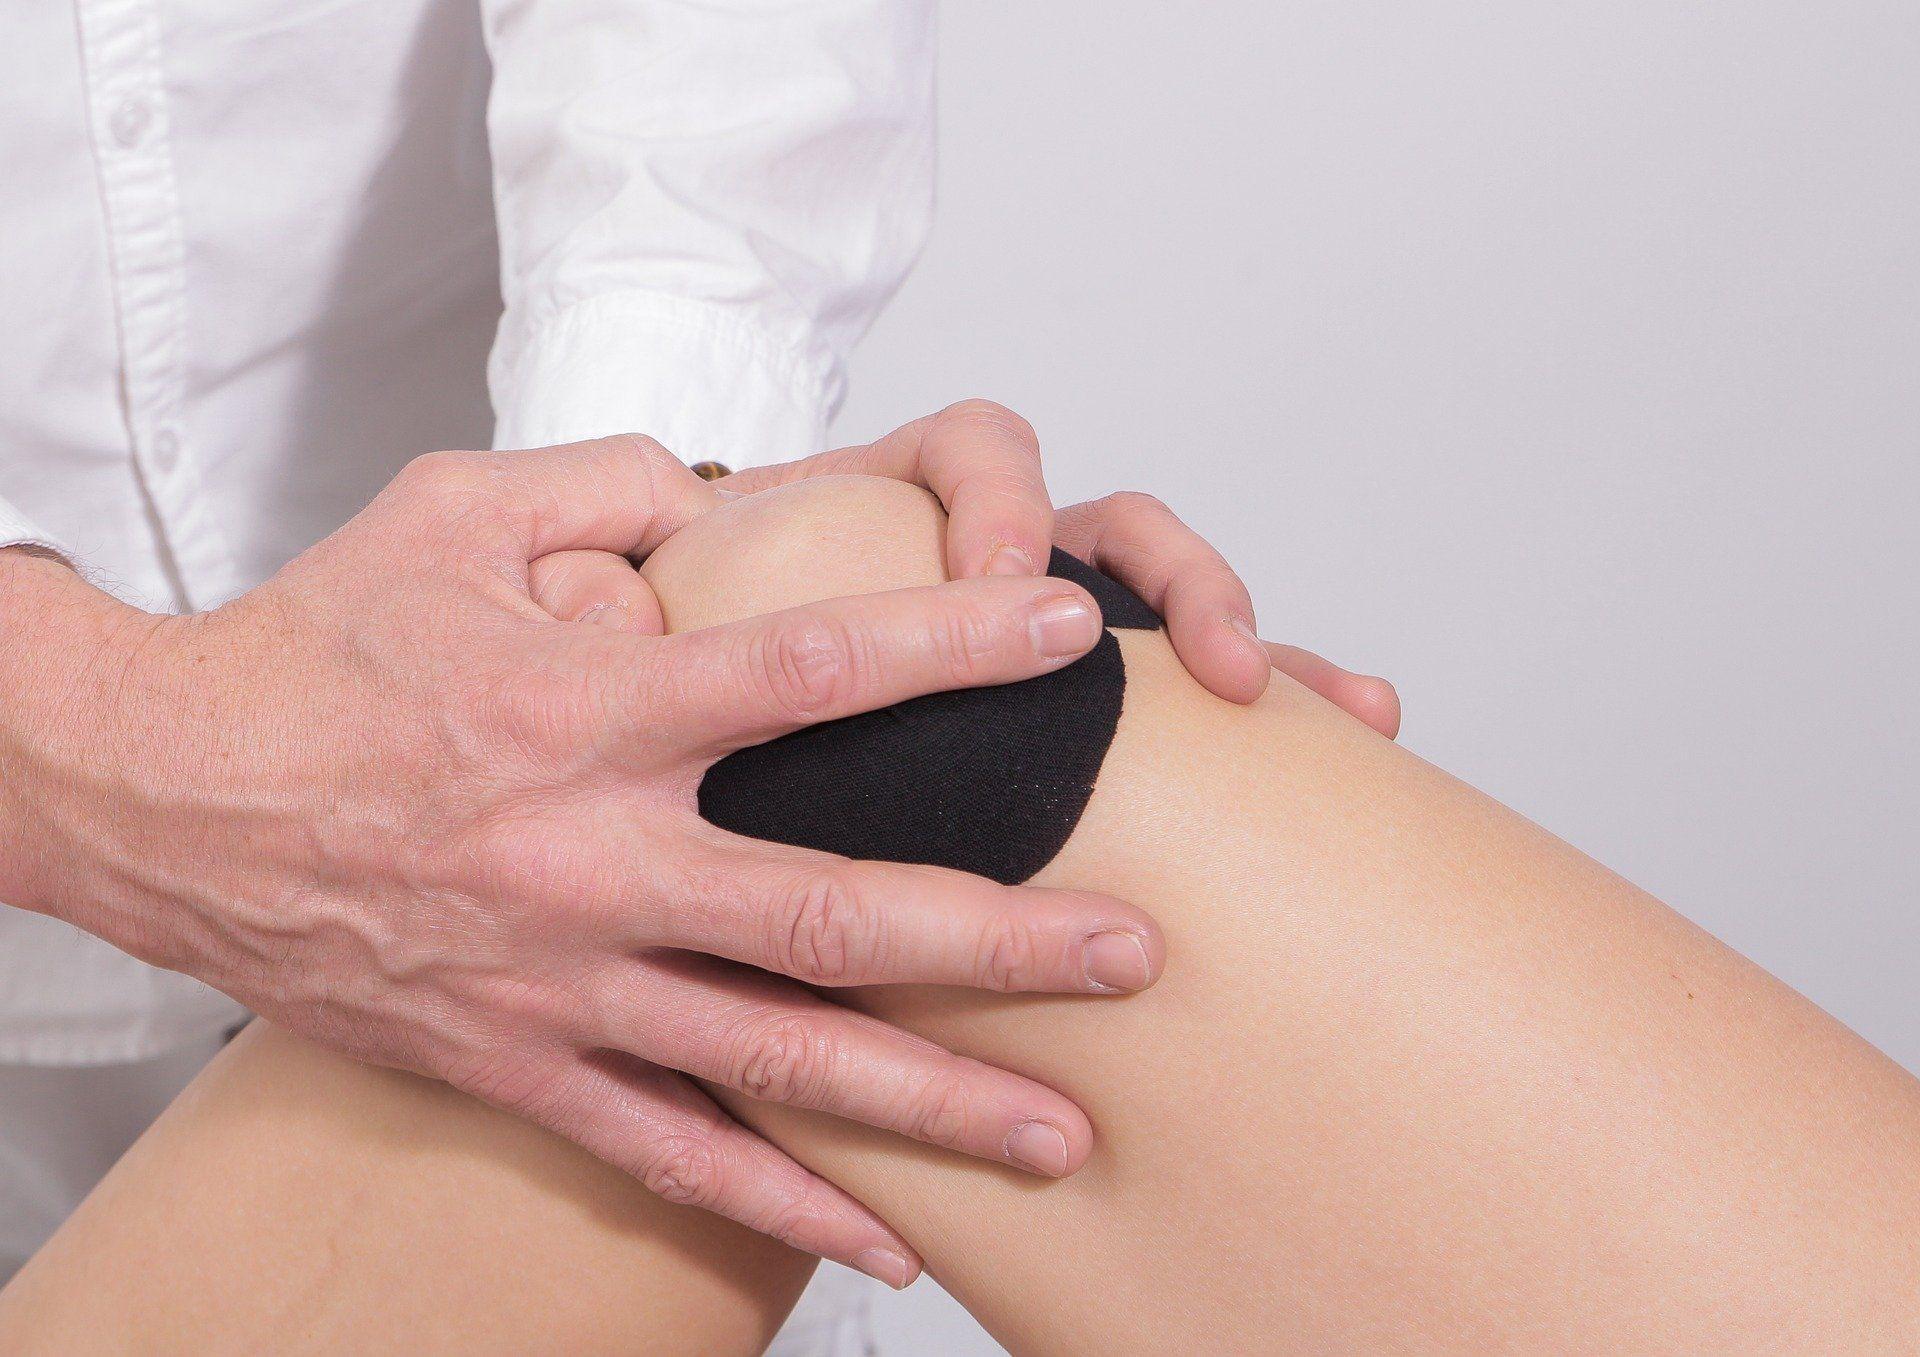 Unklare Knieschmerzen?